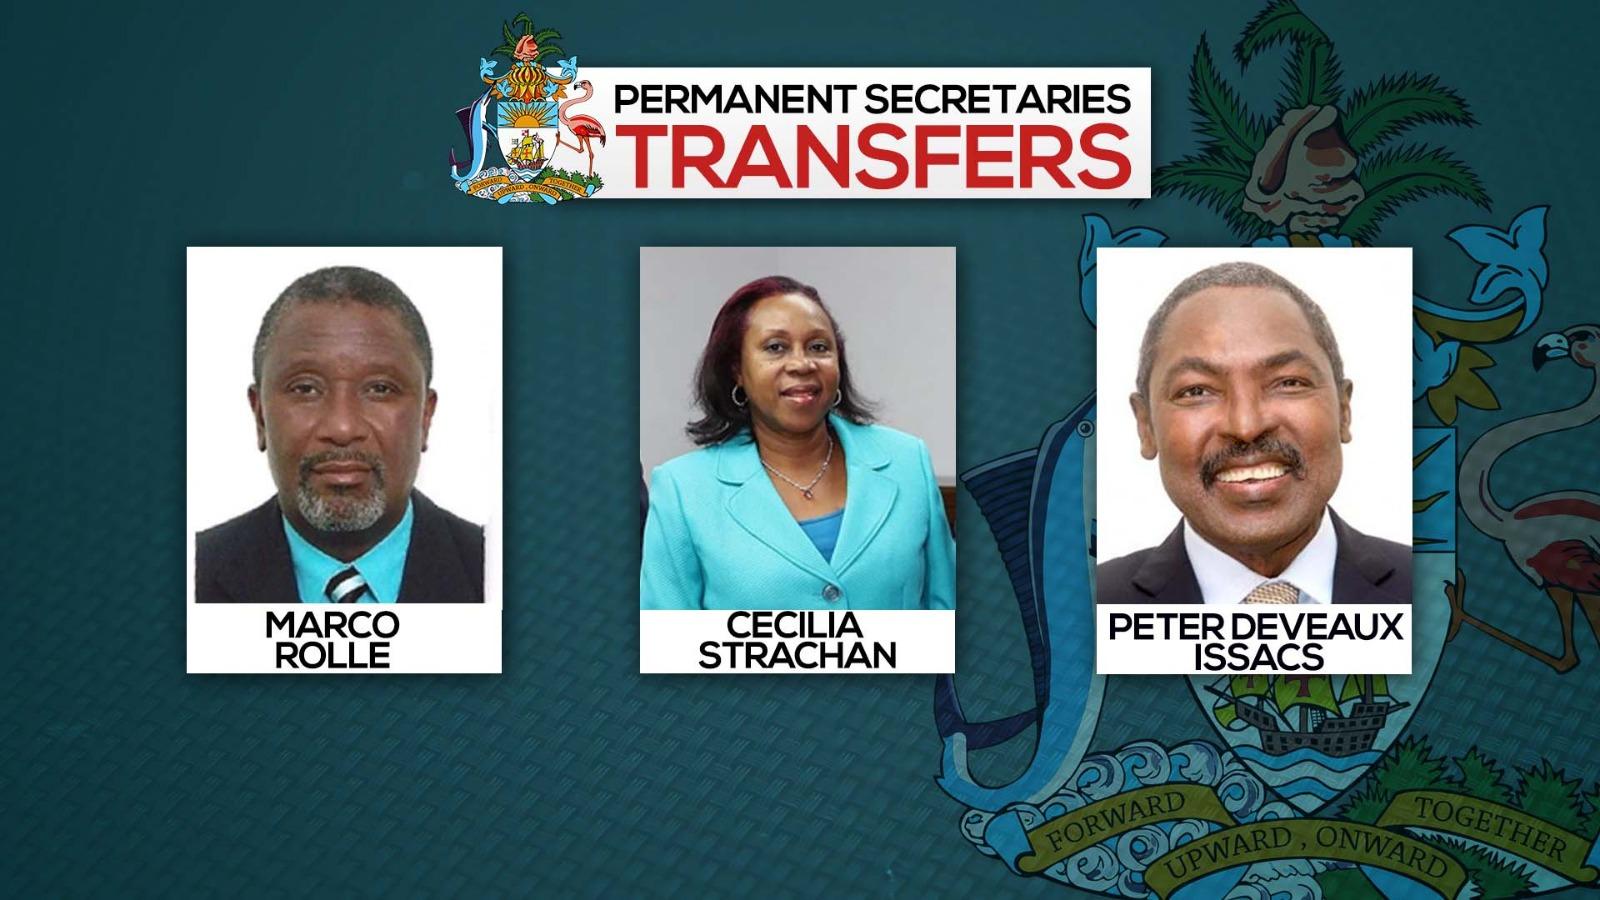 Permanent Secretaries transferred